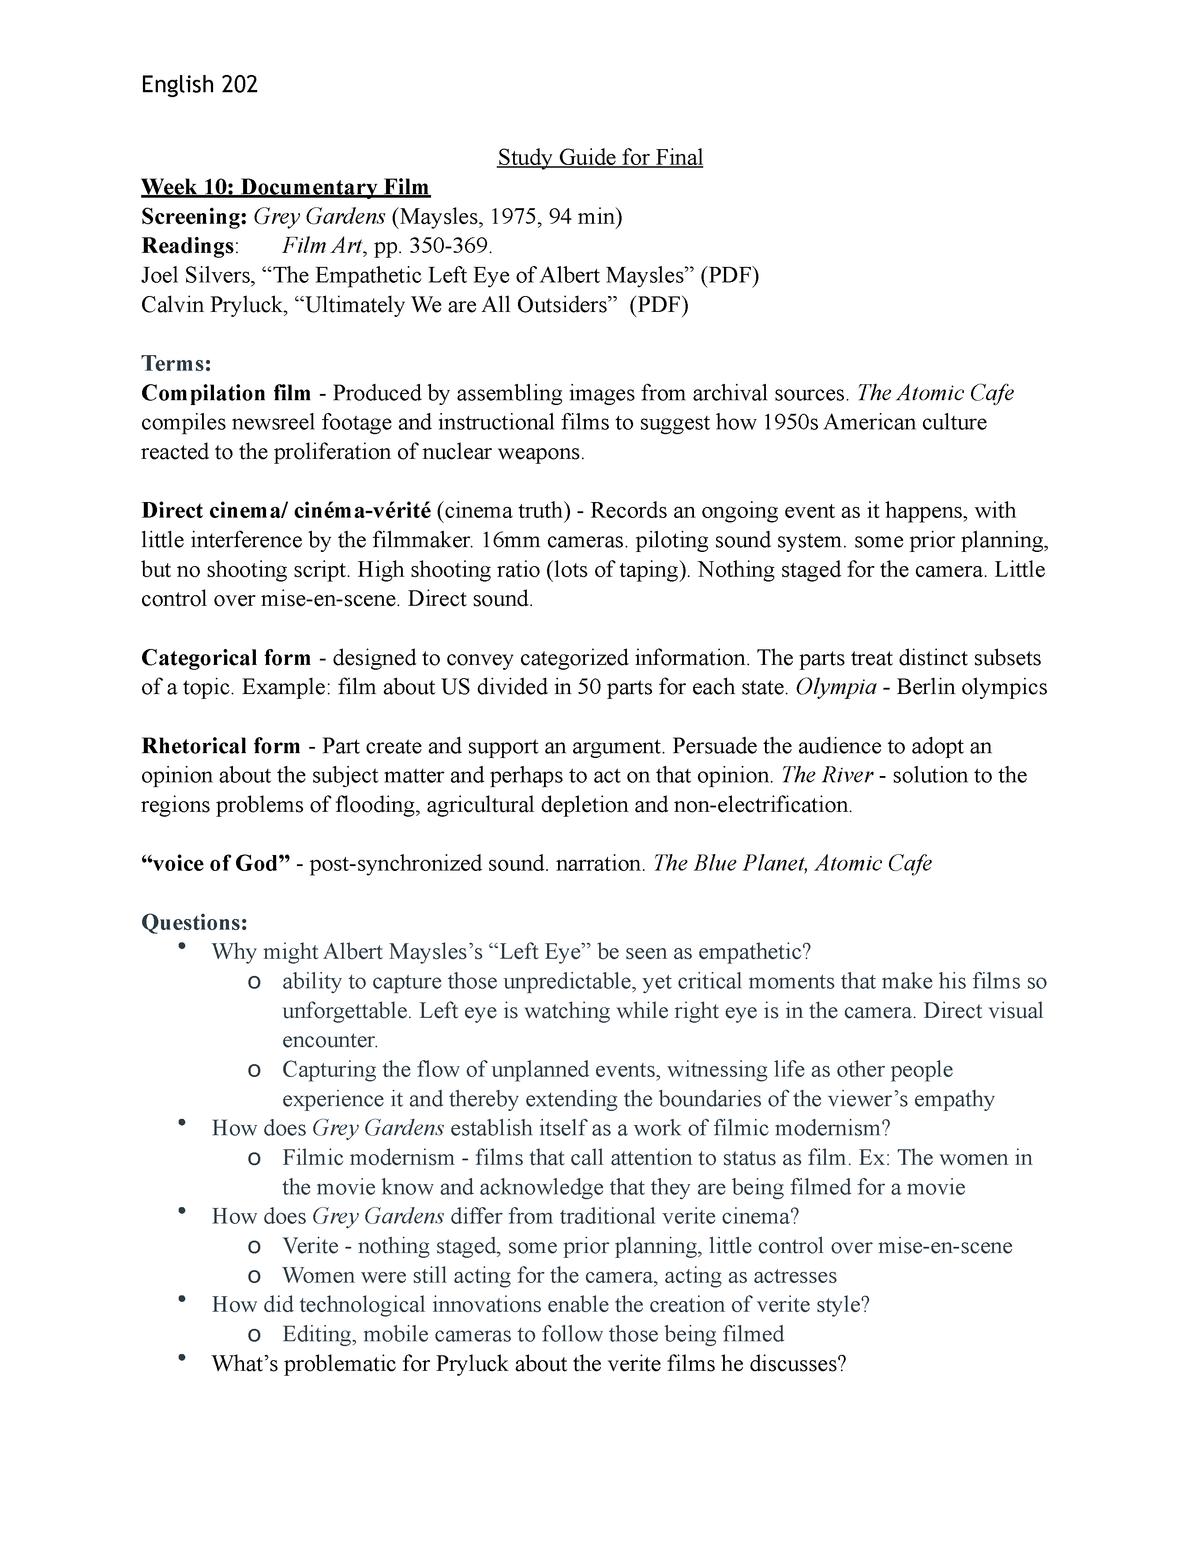 Exam 2016 Eng 202 Film Analysis And Interpretation Studocu